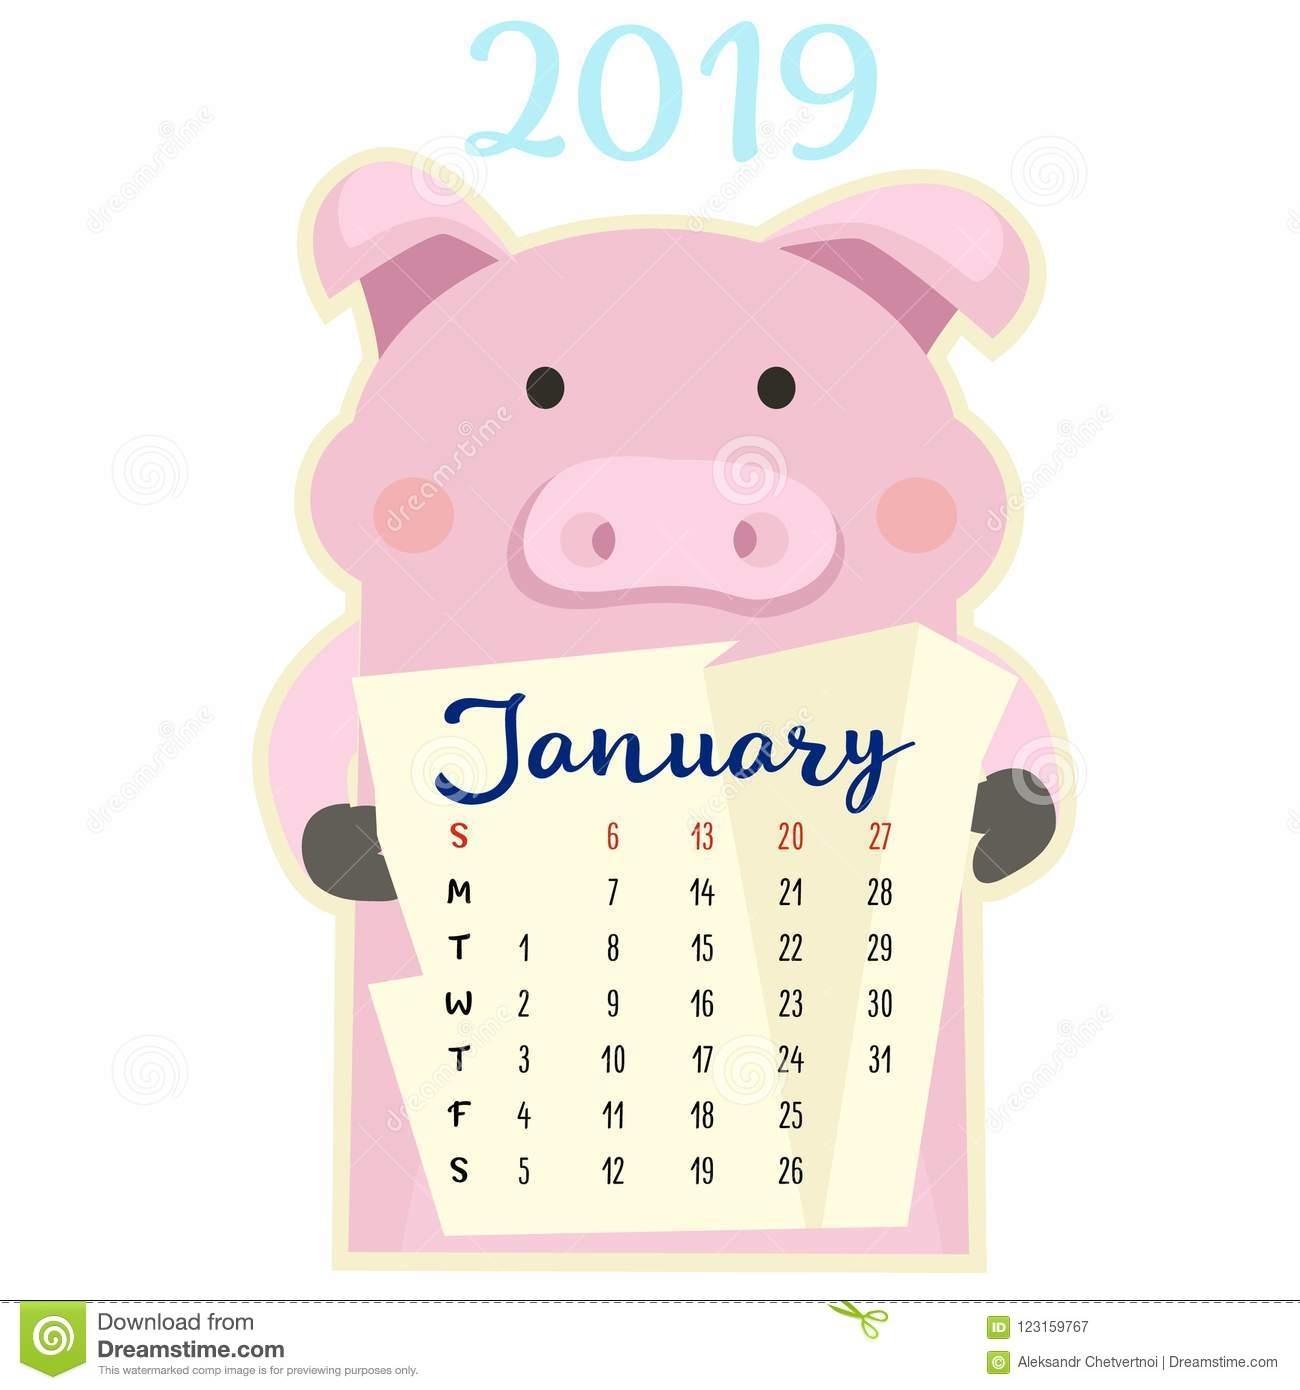 Get Kalender Met Varkens